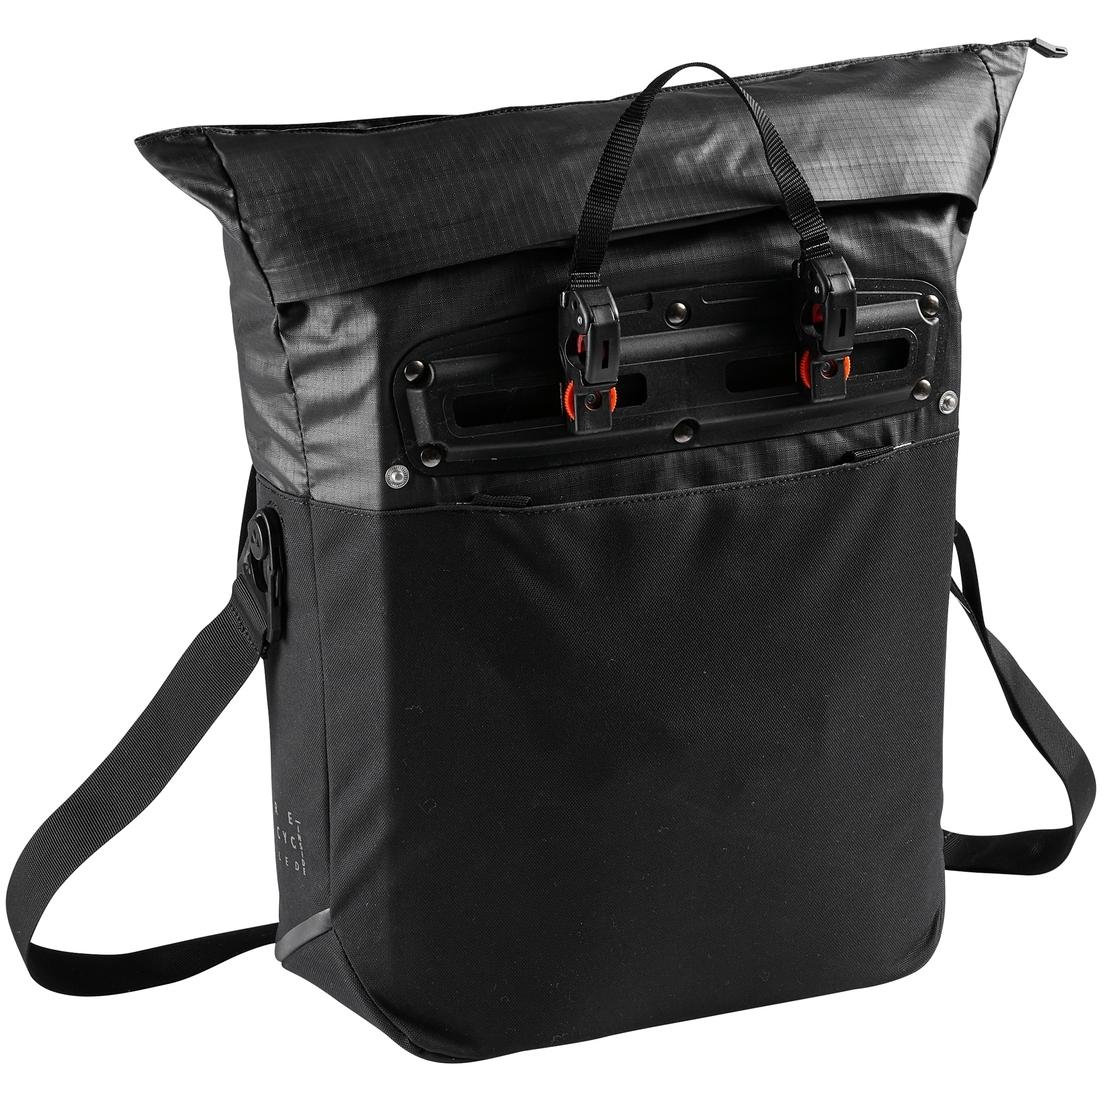 Image of Vaude CityShop Bike Bag - black